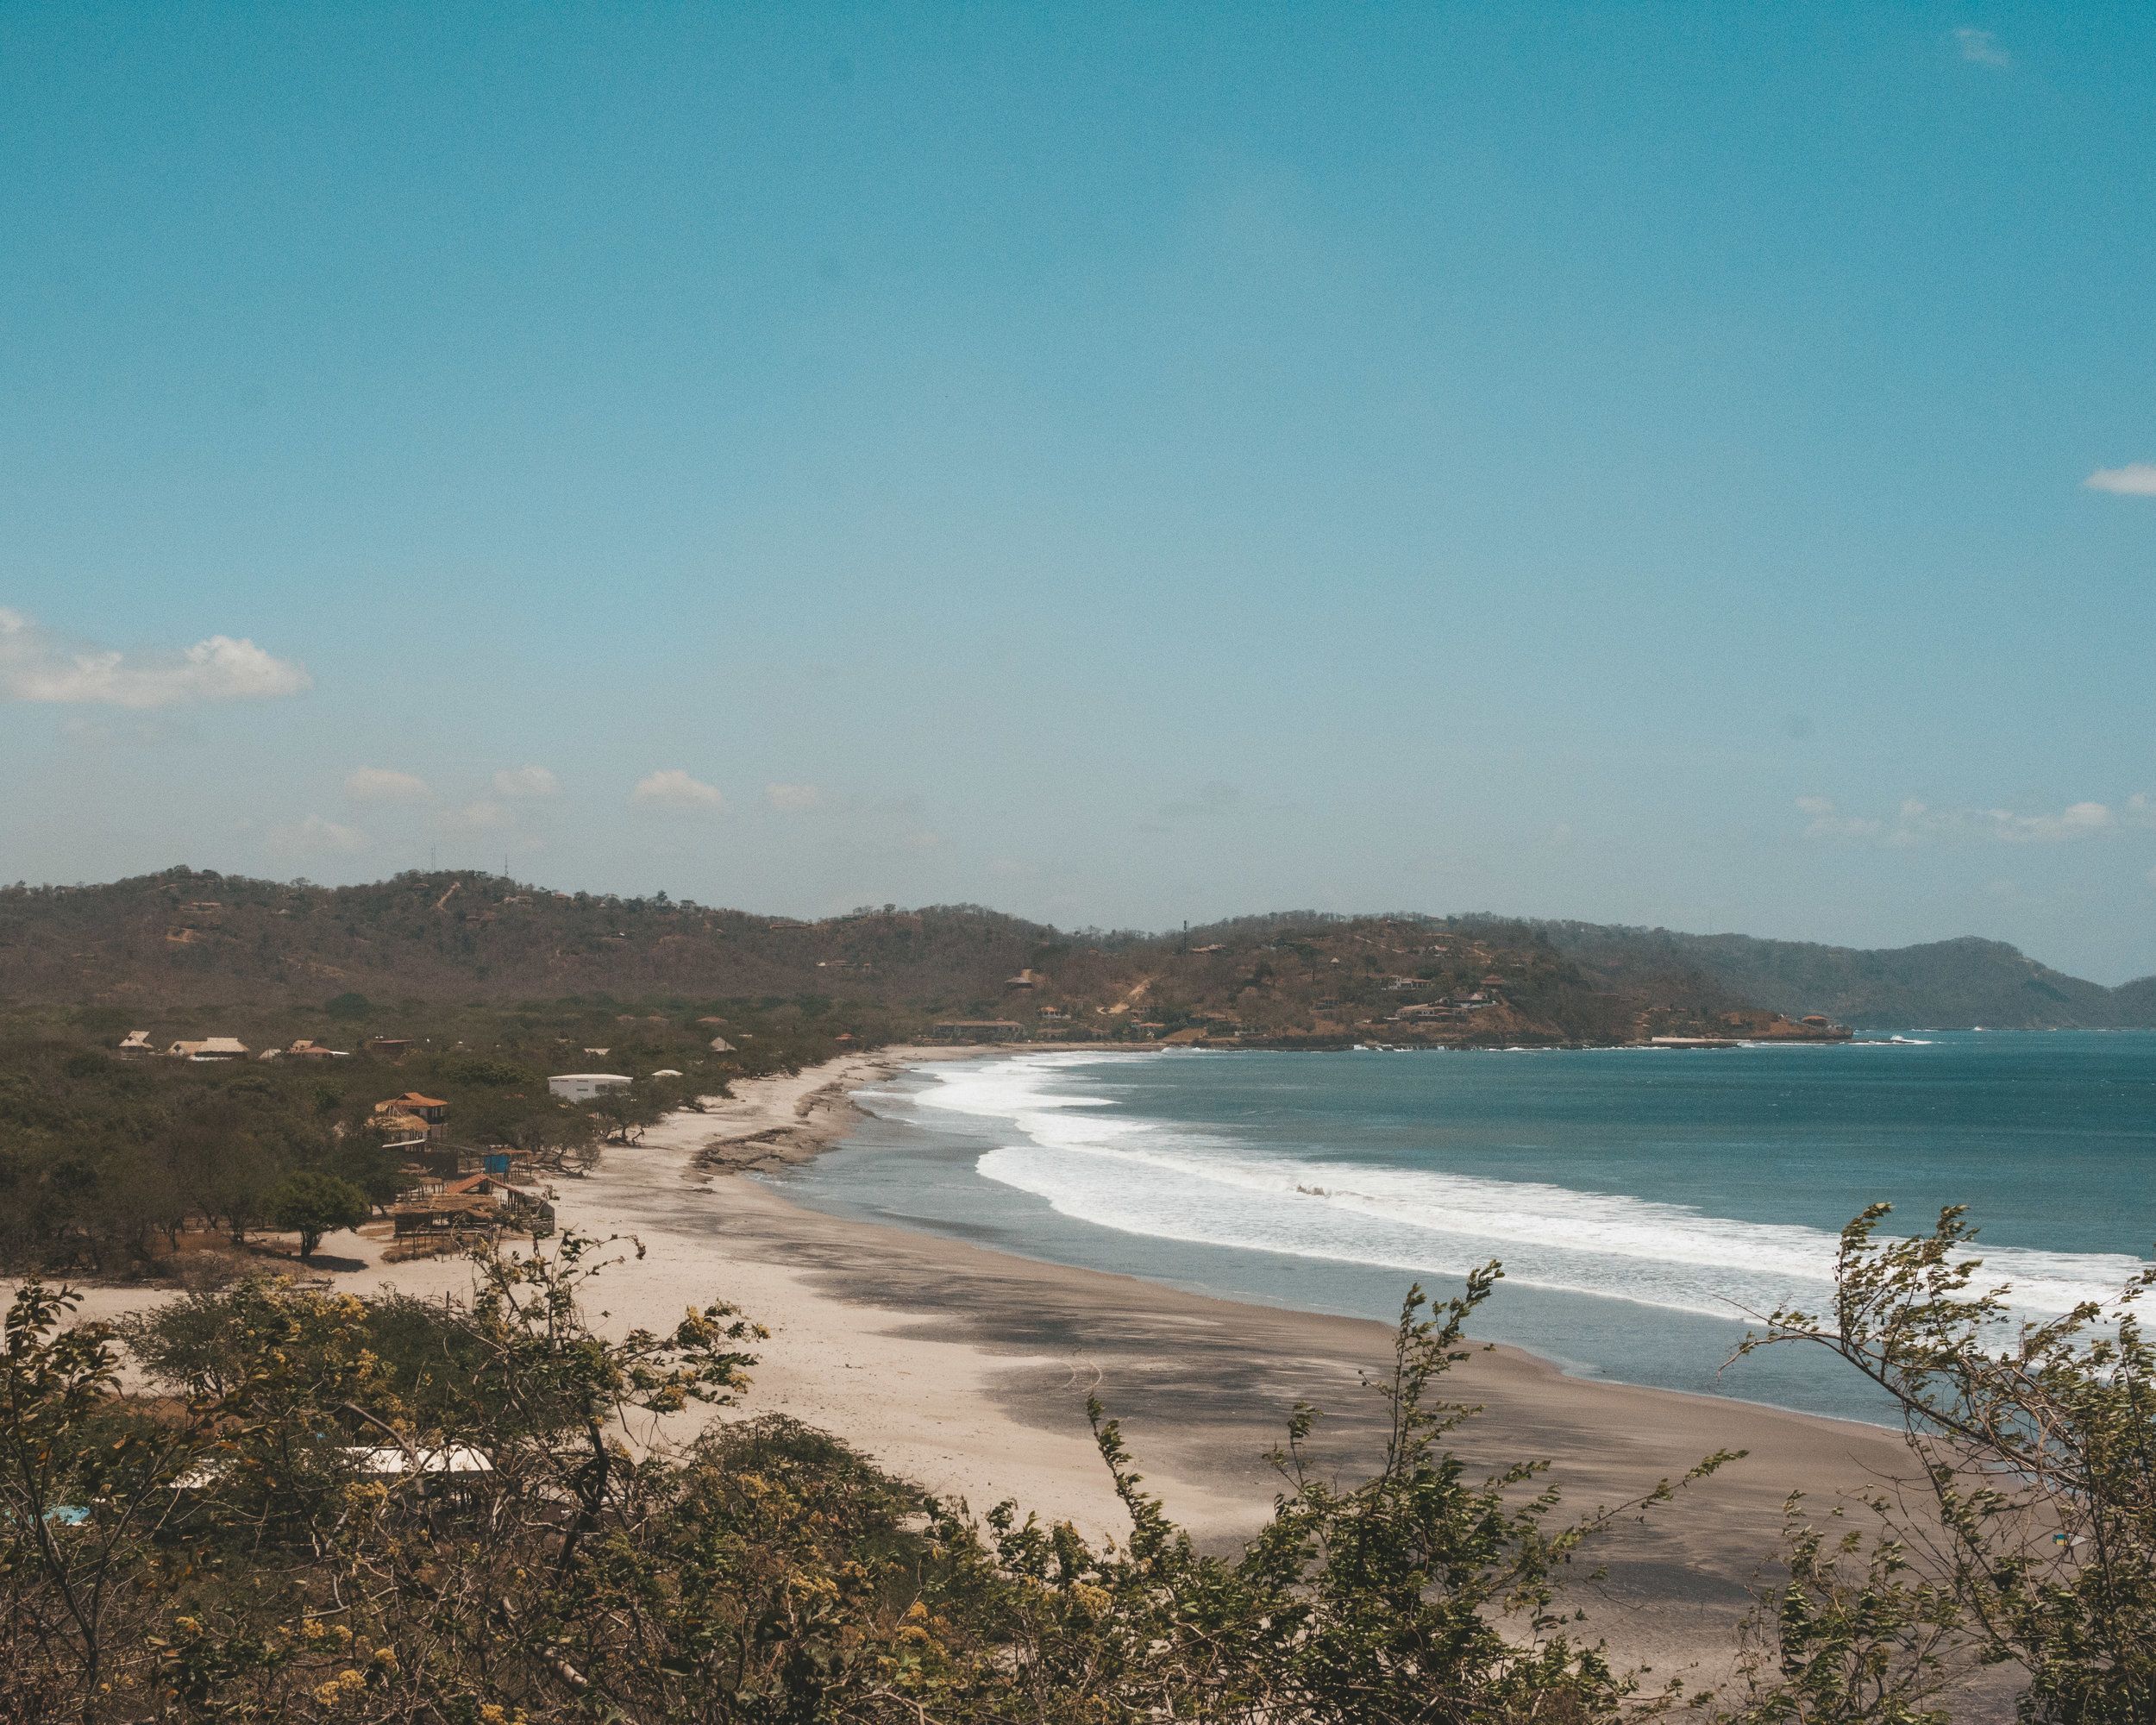 Views of Popoyo, Nicaragua